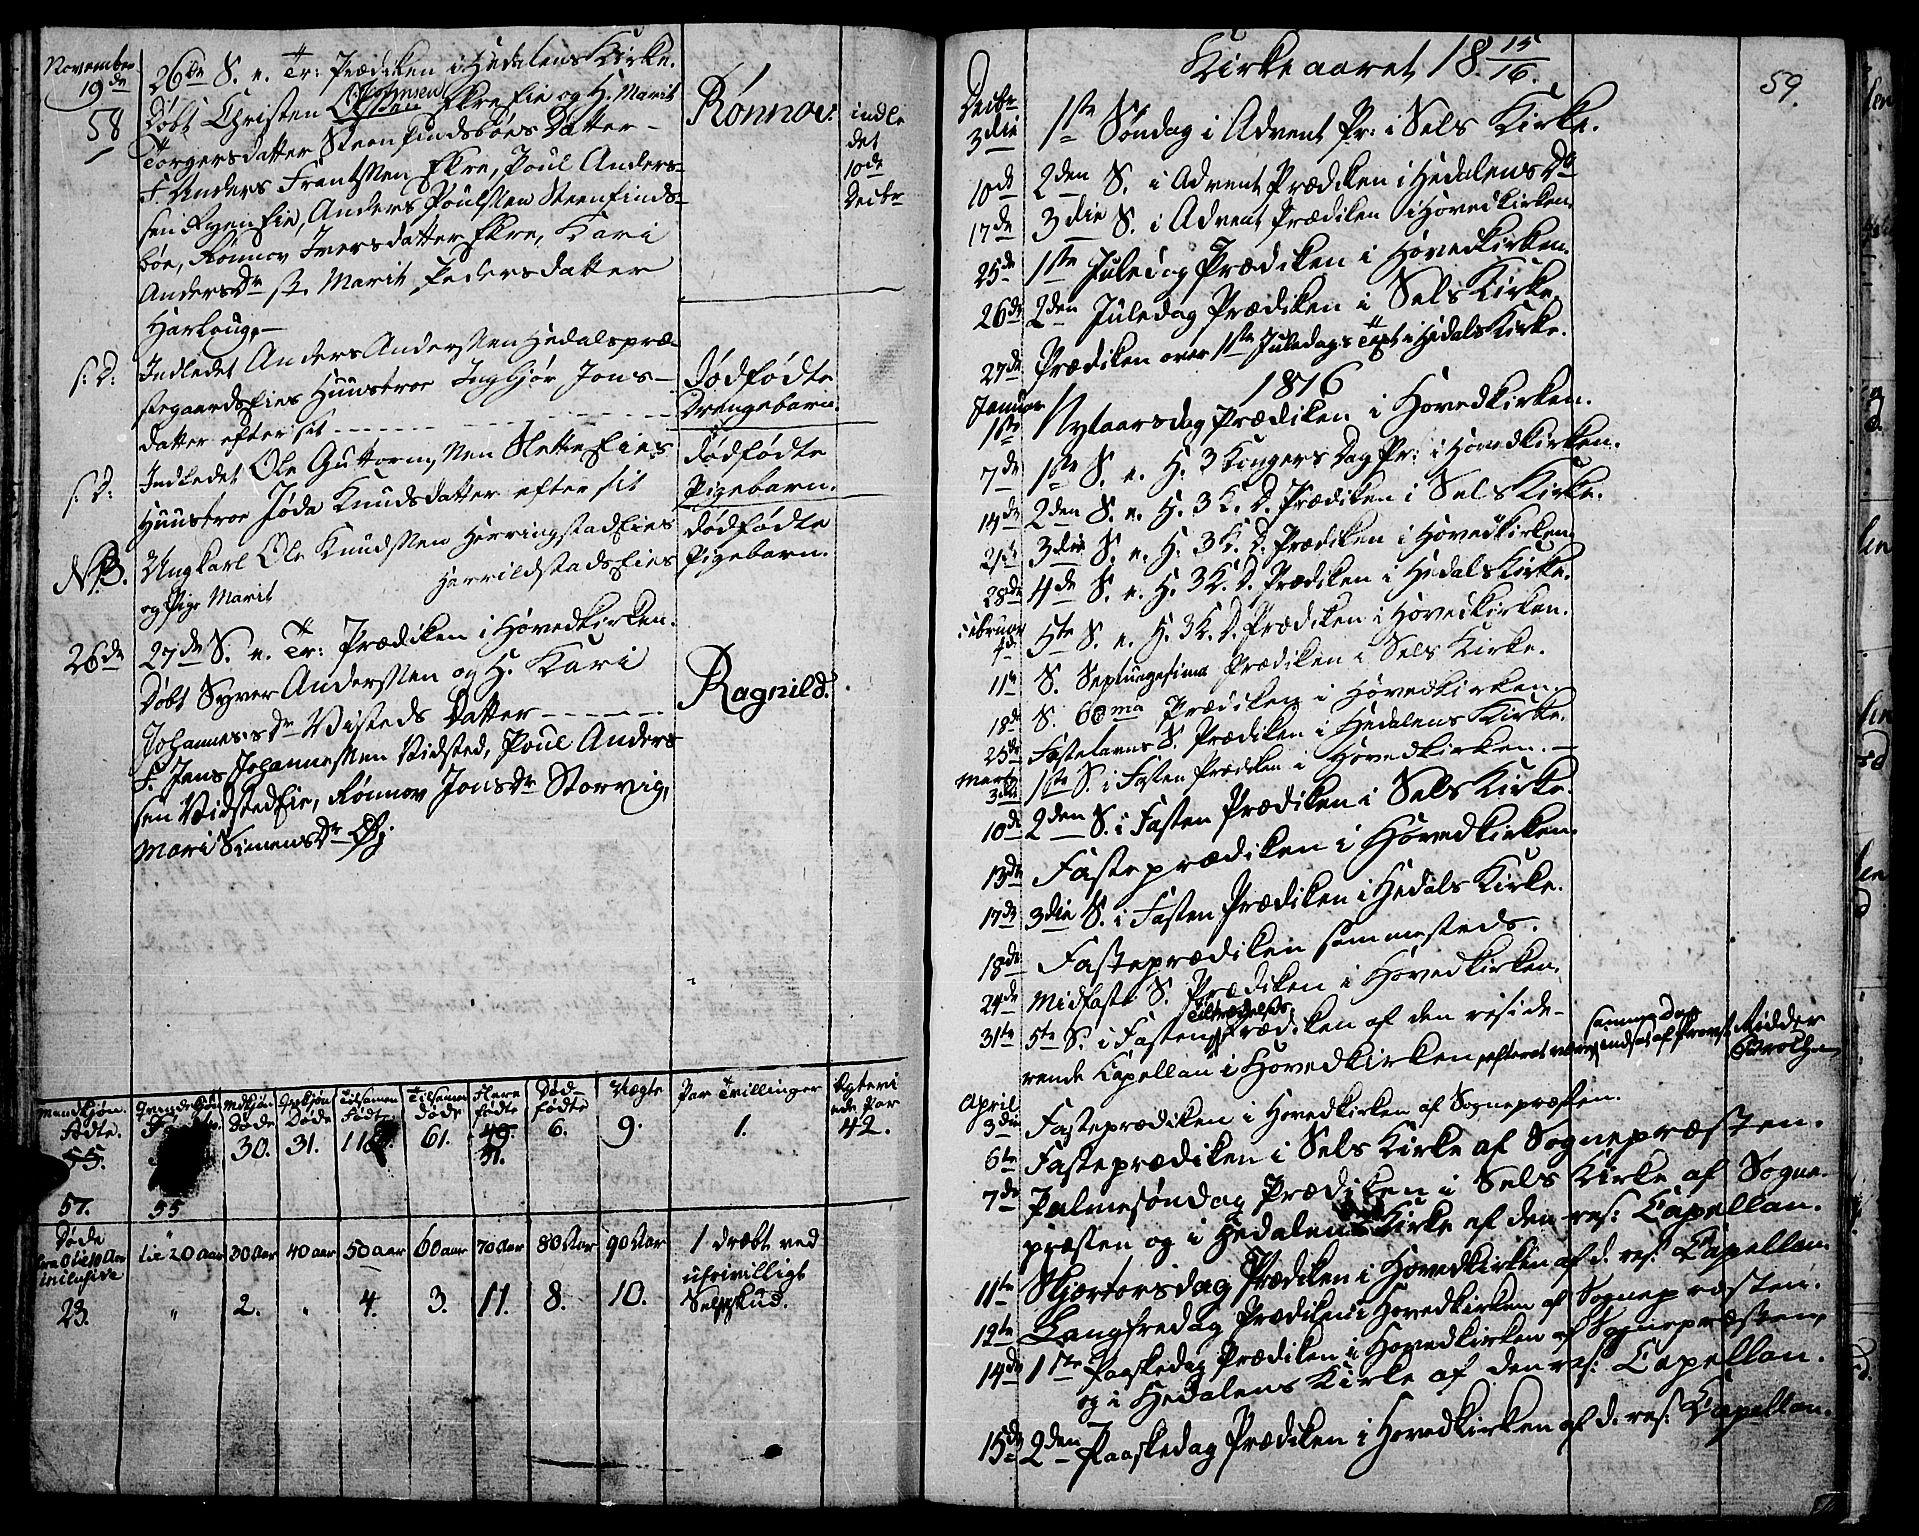 SAH, Vågå prestekontor, Ministerialbok nr. 2, 1810-1815, s. 58-59